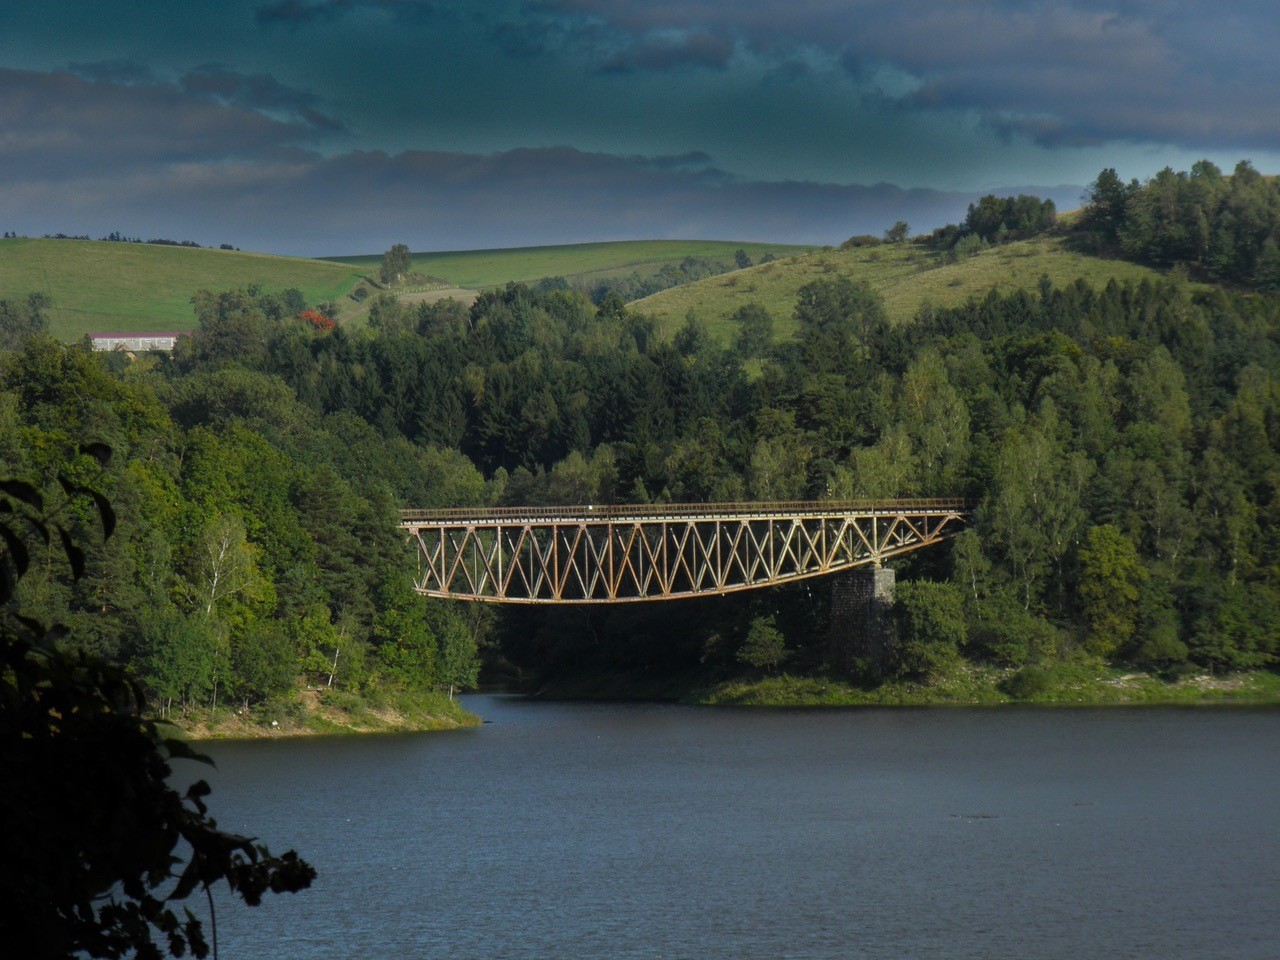 Bogenbrücke Mauer unter Denkmalschutz